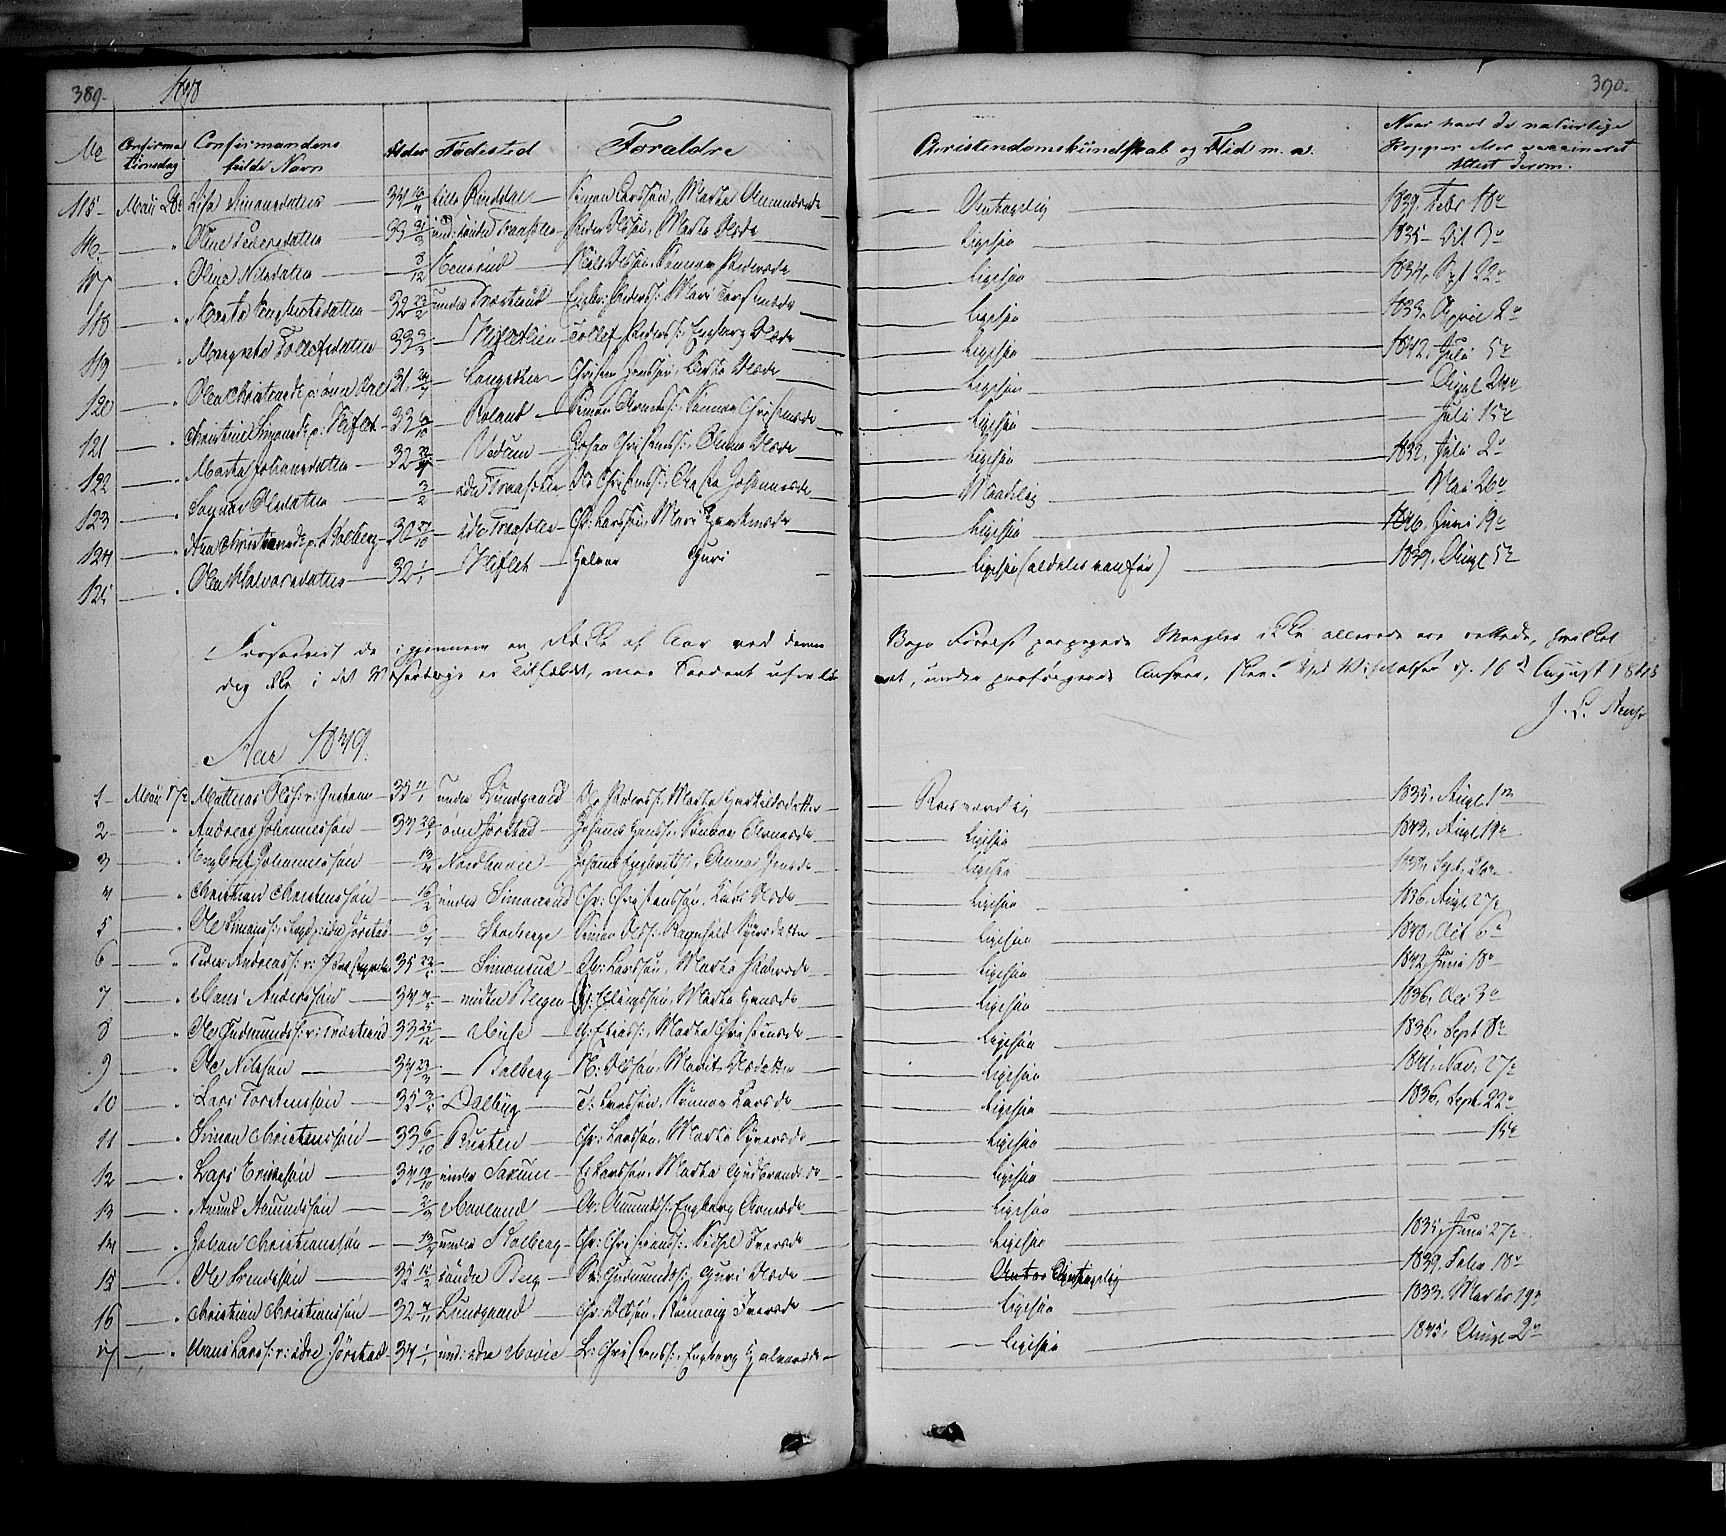 SAH, Fåberg prestekontor, Ministerialbok nr. 5, 1836-1854, s. 389-390